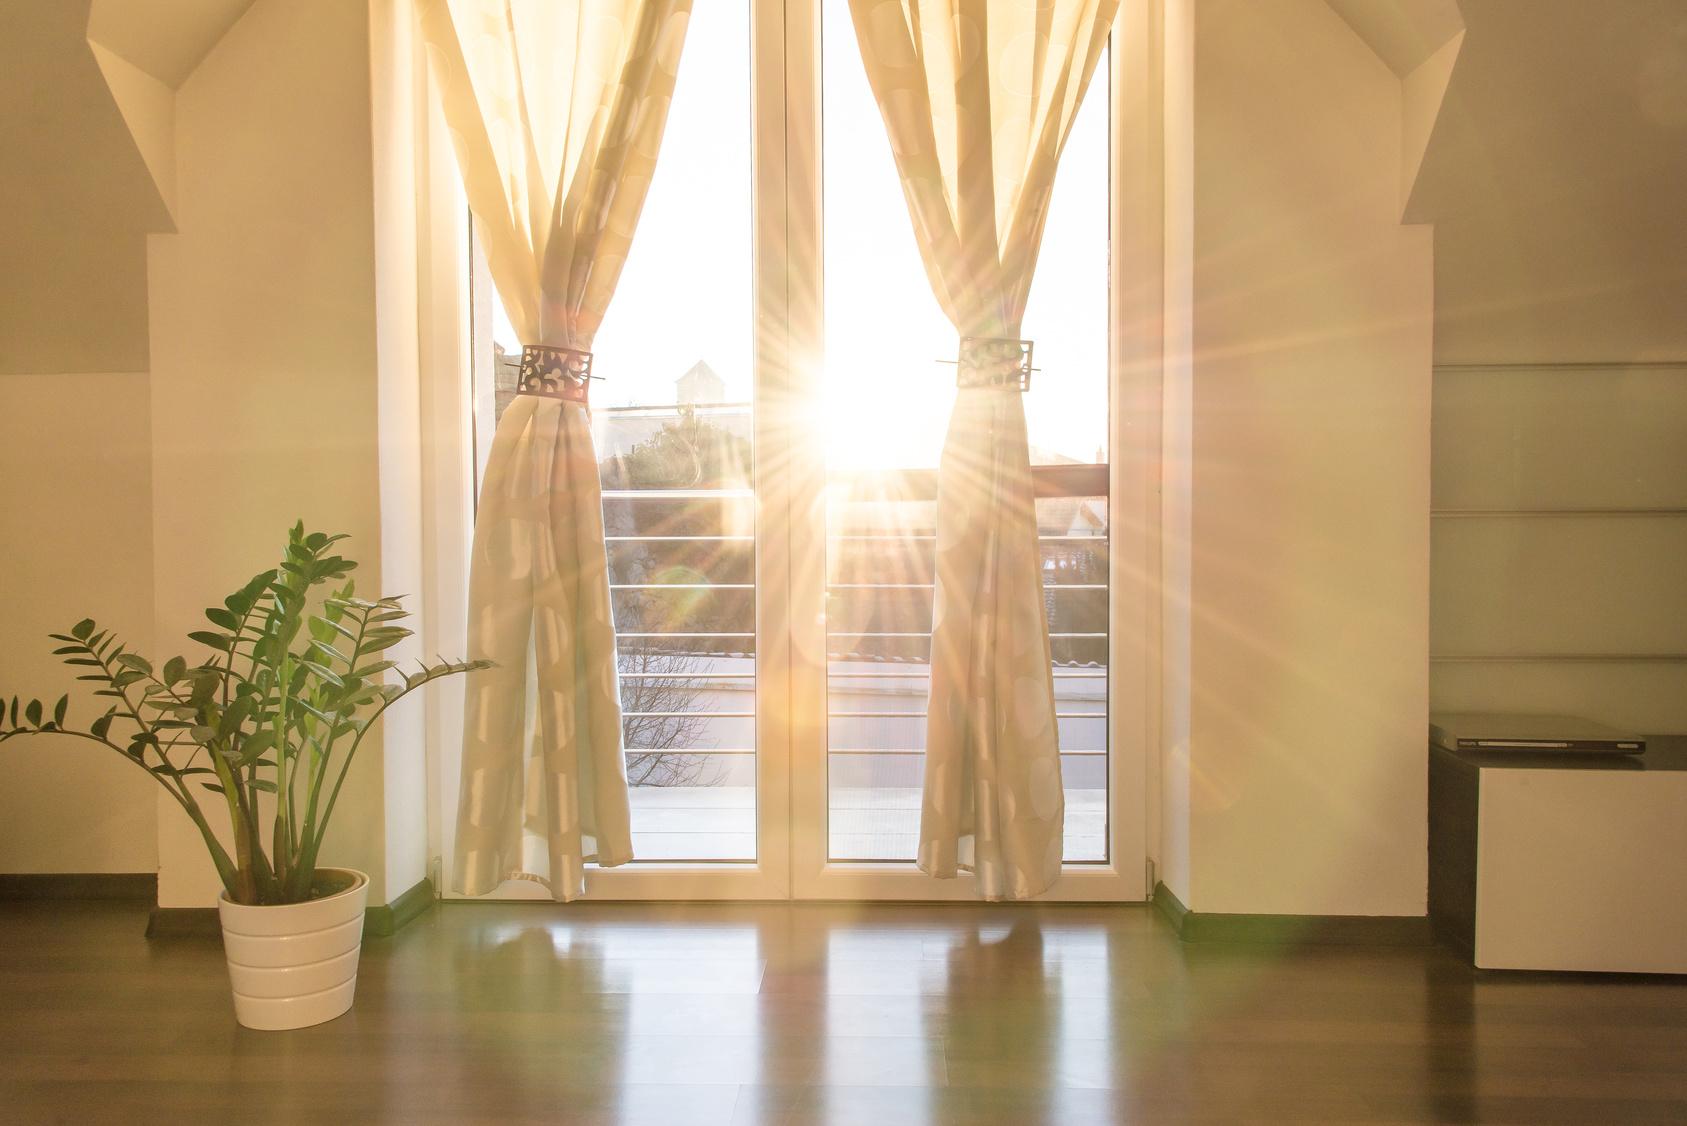 Gardinen 6 Ideen fr das Wohnzimmer